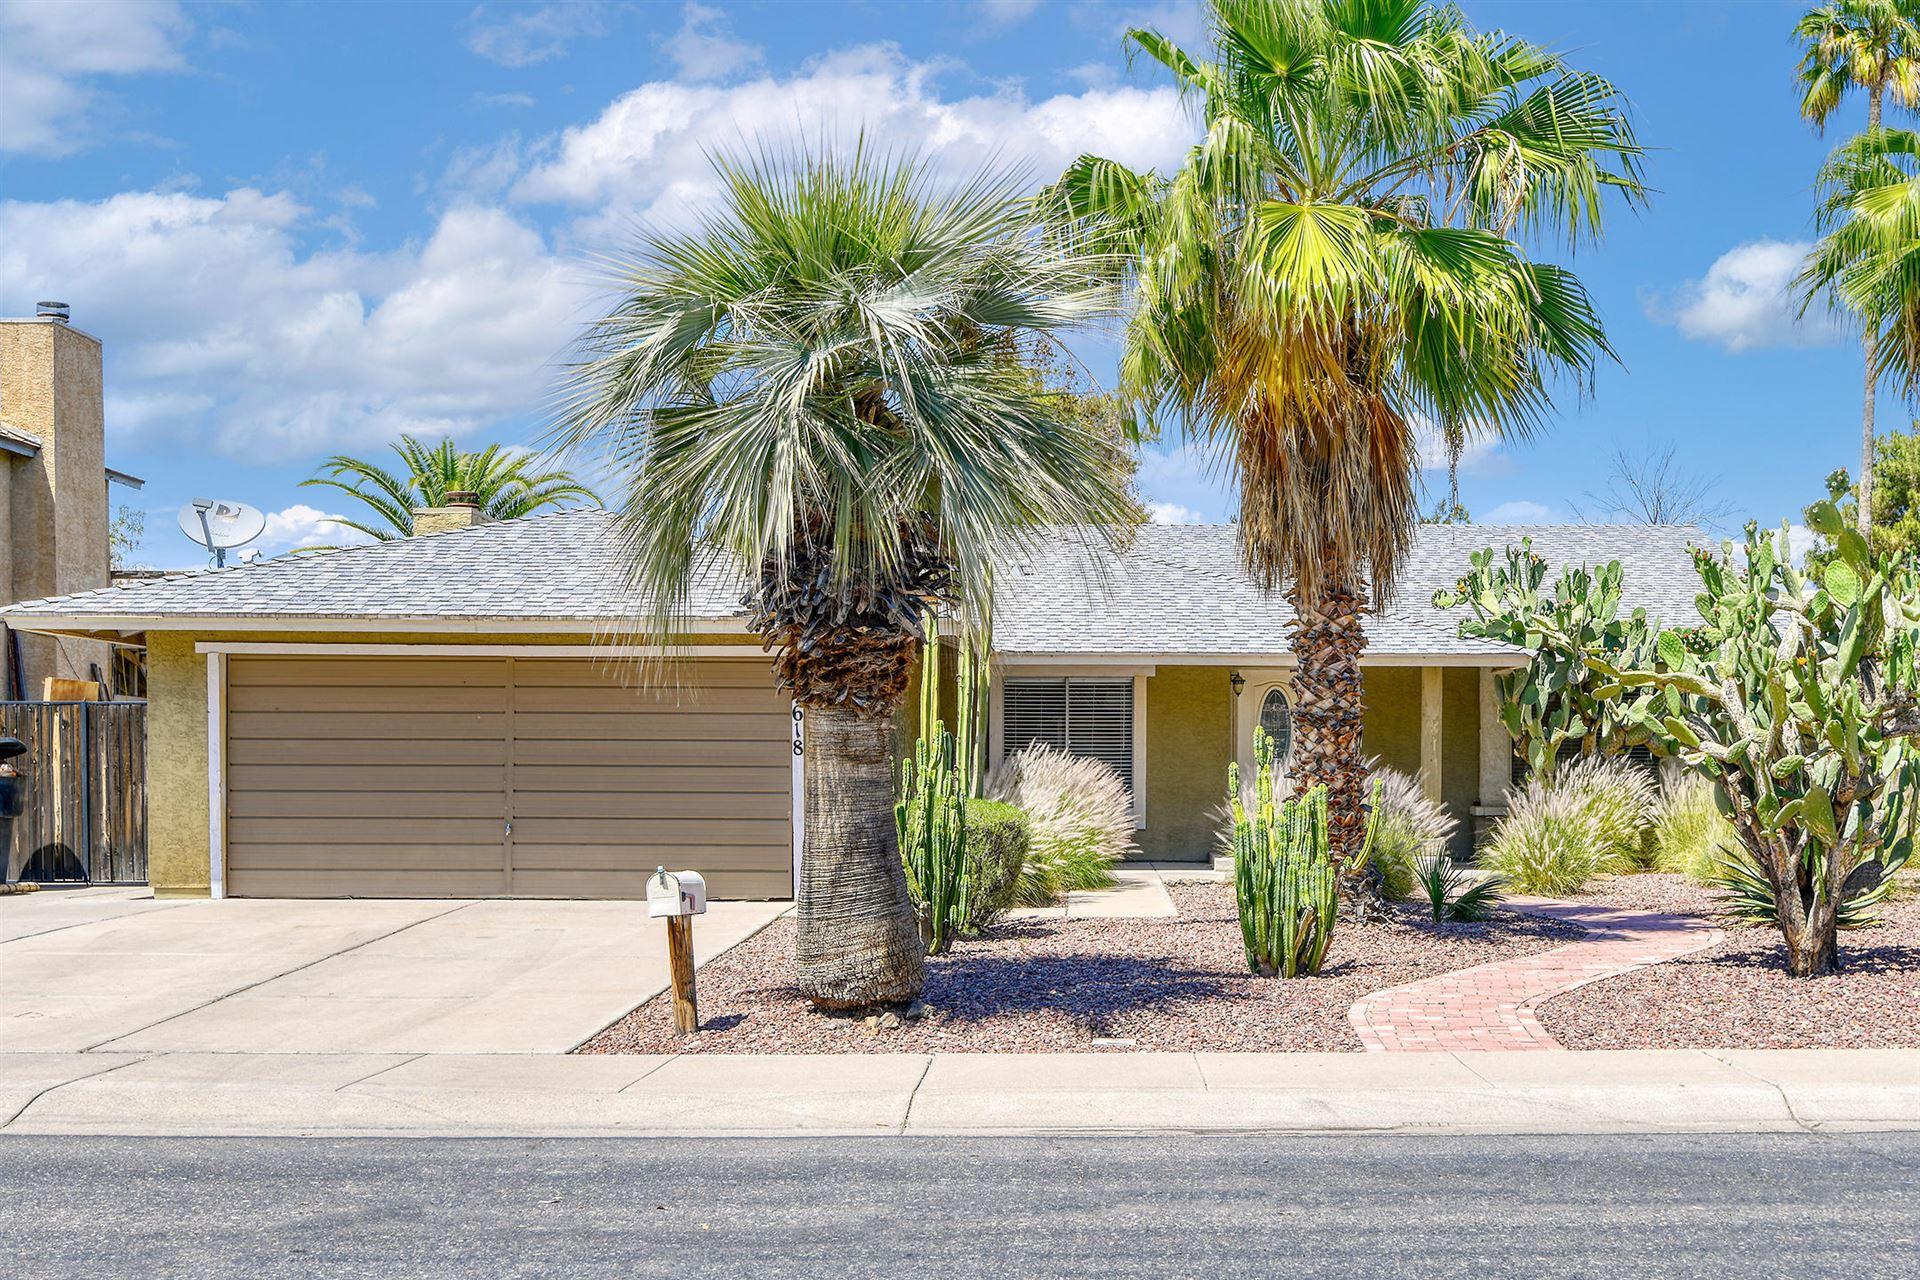 Photo of 4618 W MERCURY Way, Chandler, AZ 85226 (MLS # 6227421)